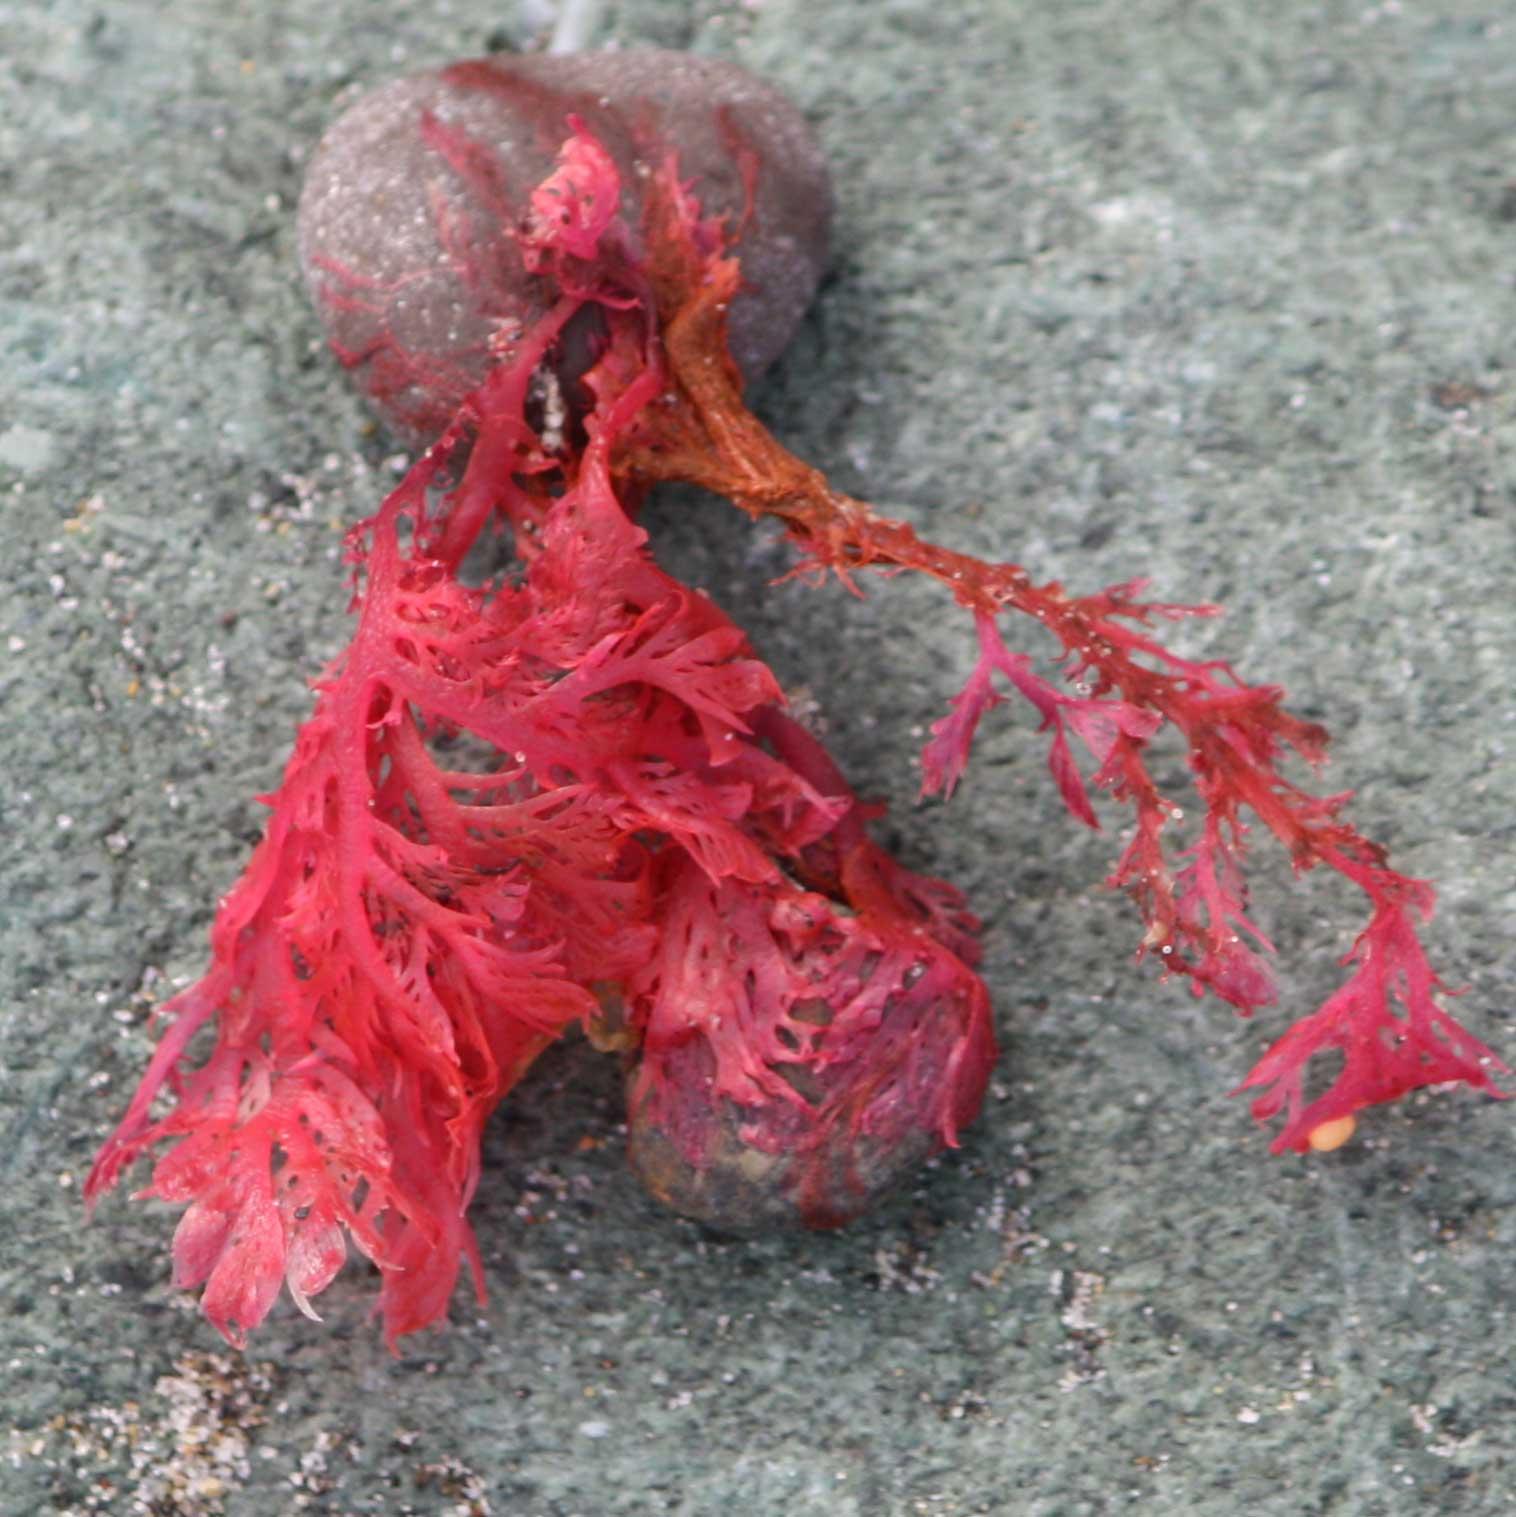 Seaweed-hot-pink-close-up-square_web.jpg